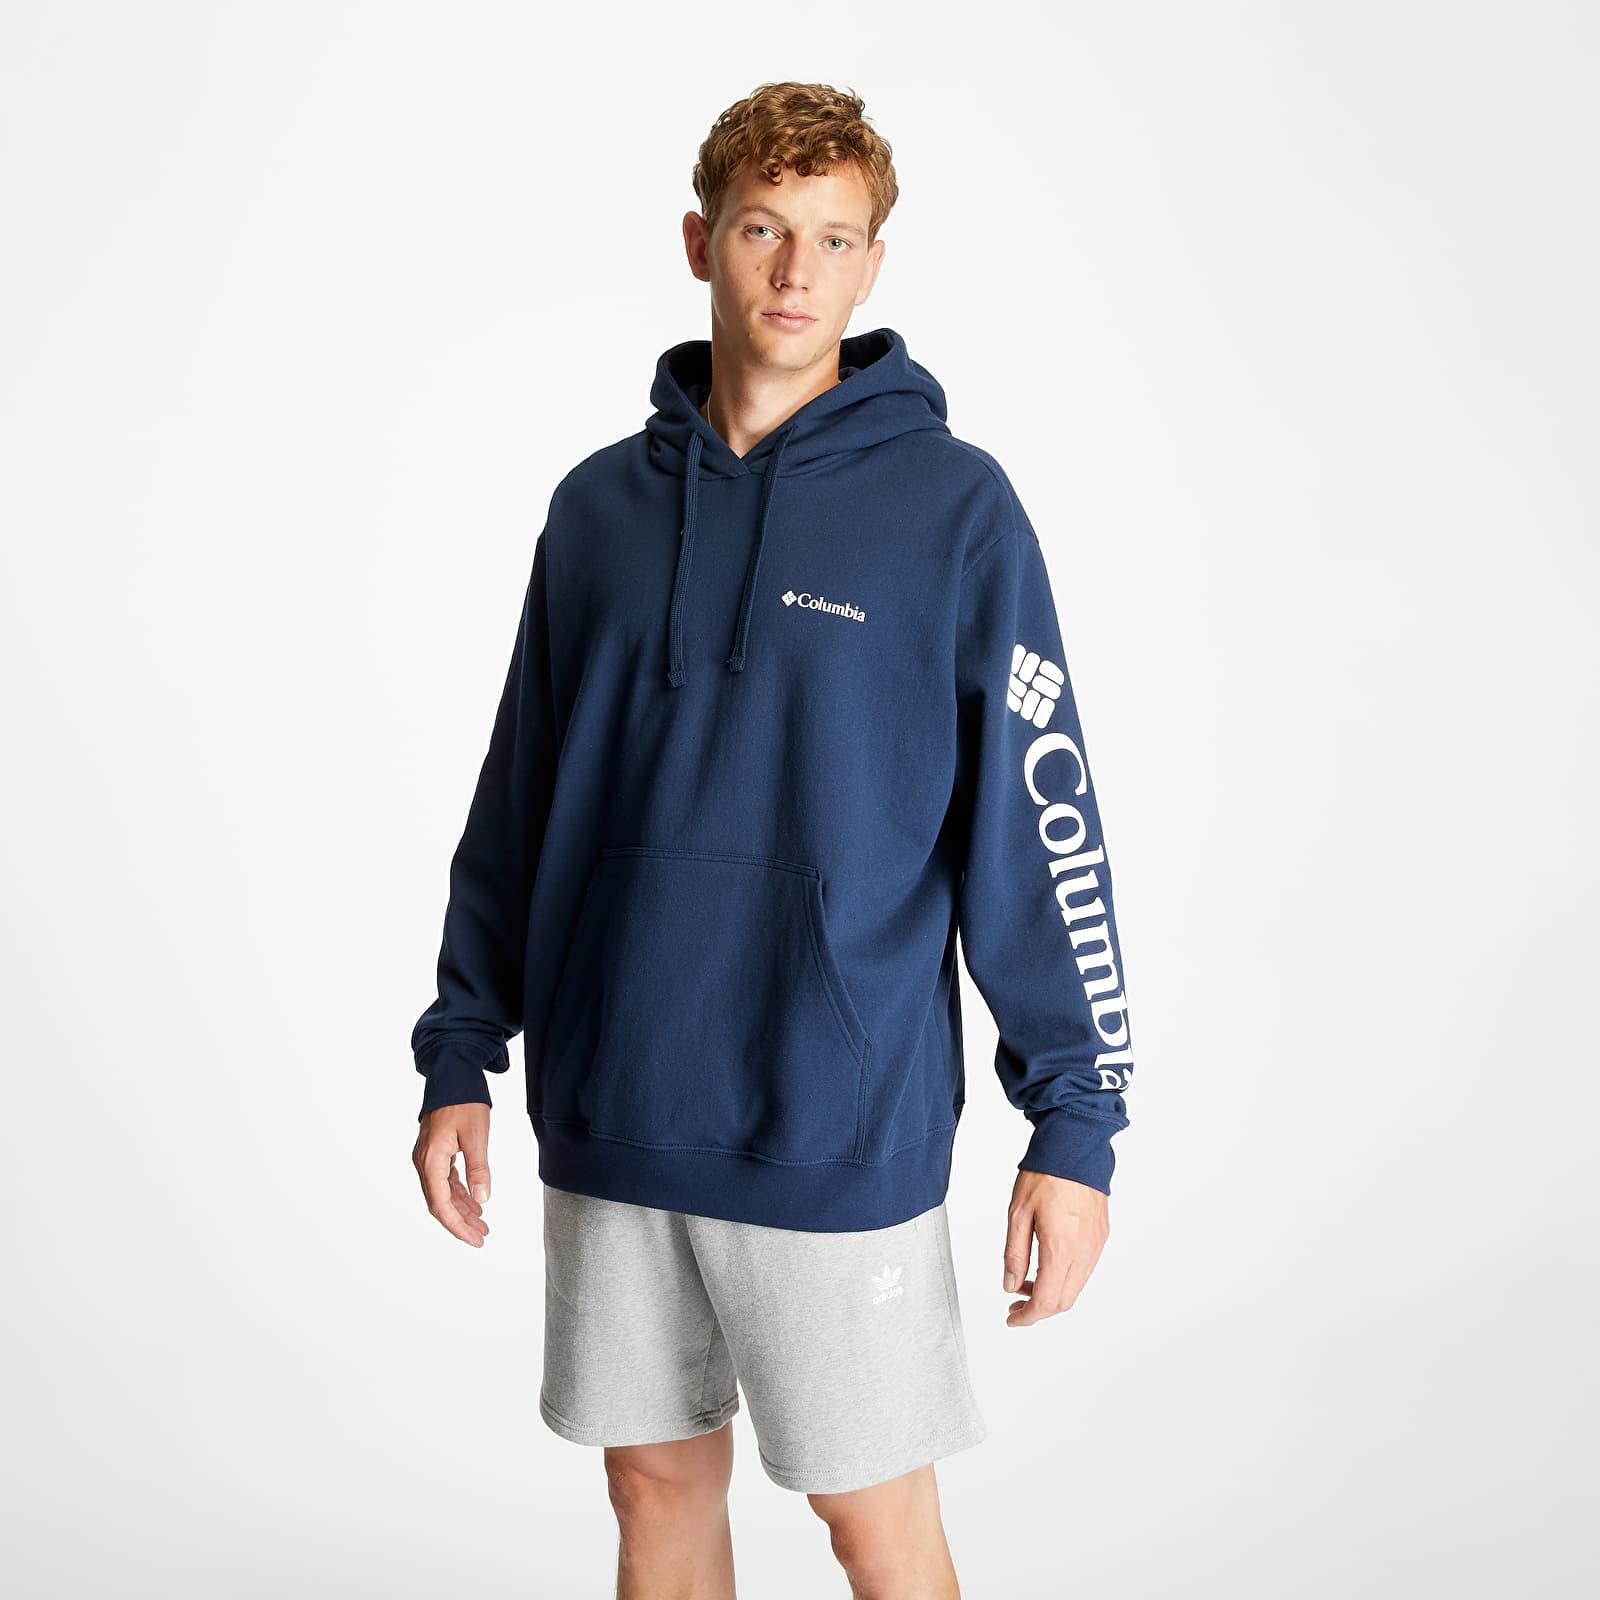 Clothing Columbia Viewmont II Sleeve Graphic Tee Collegiate Navy/ White